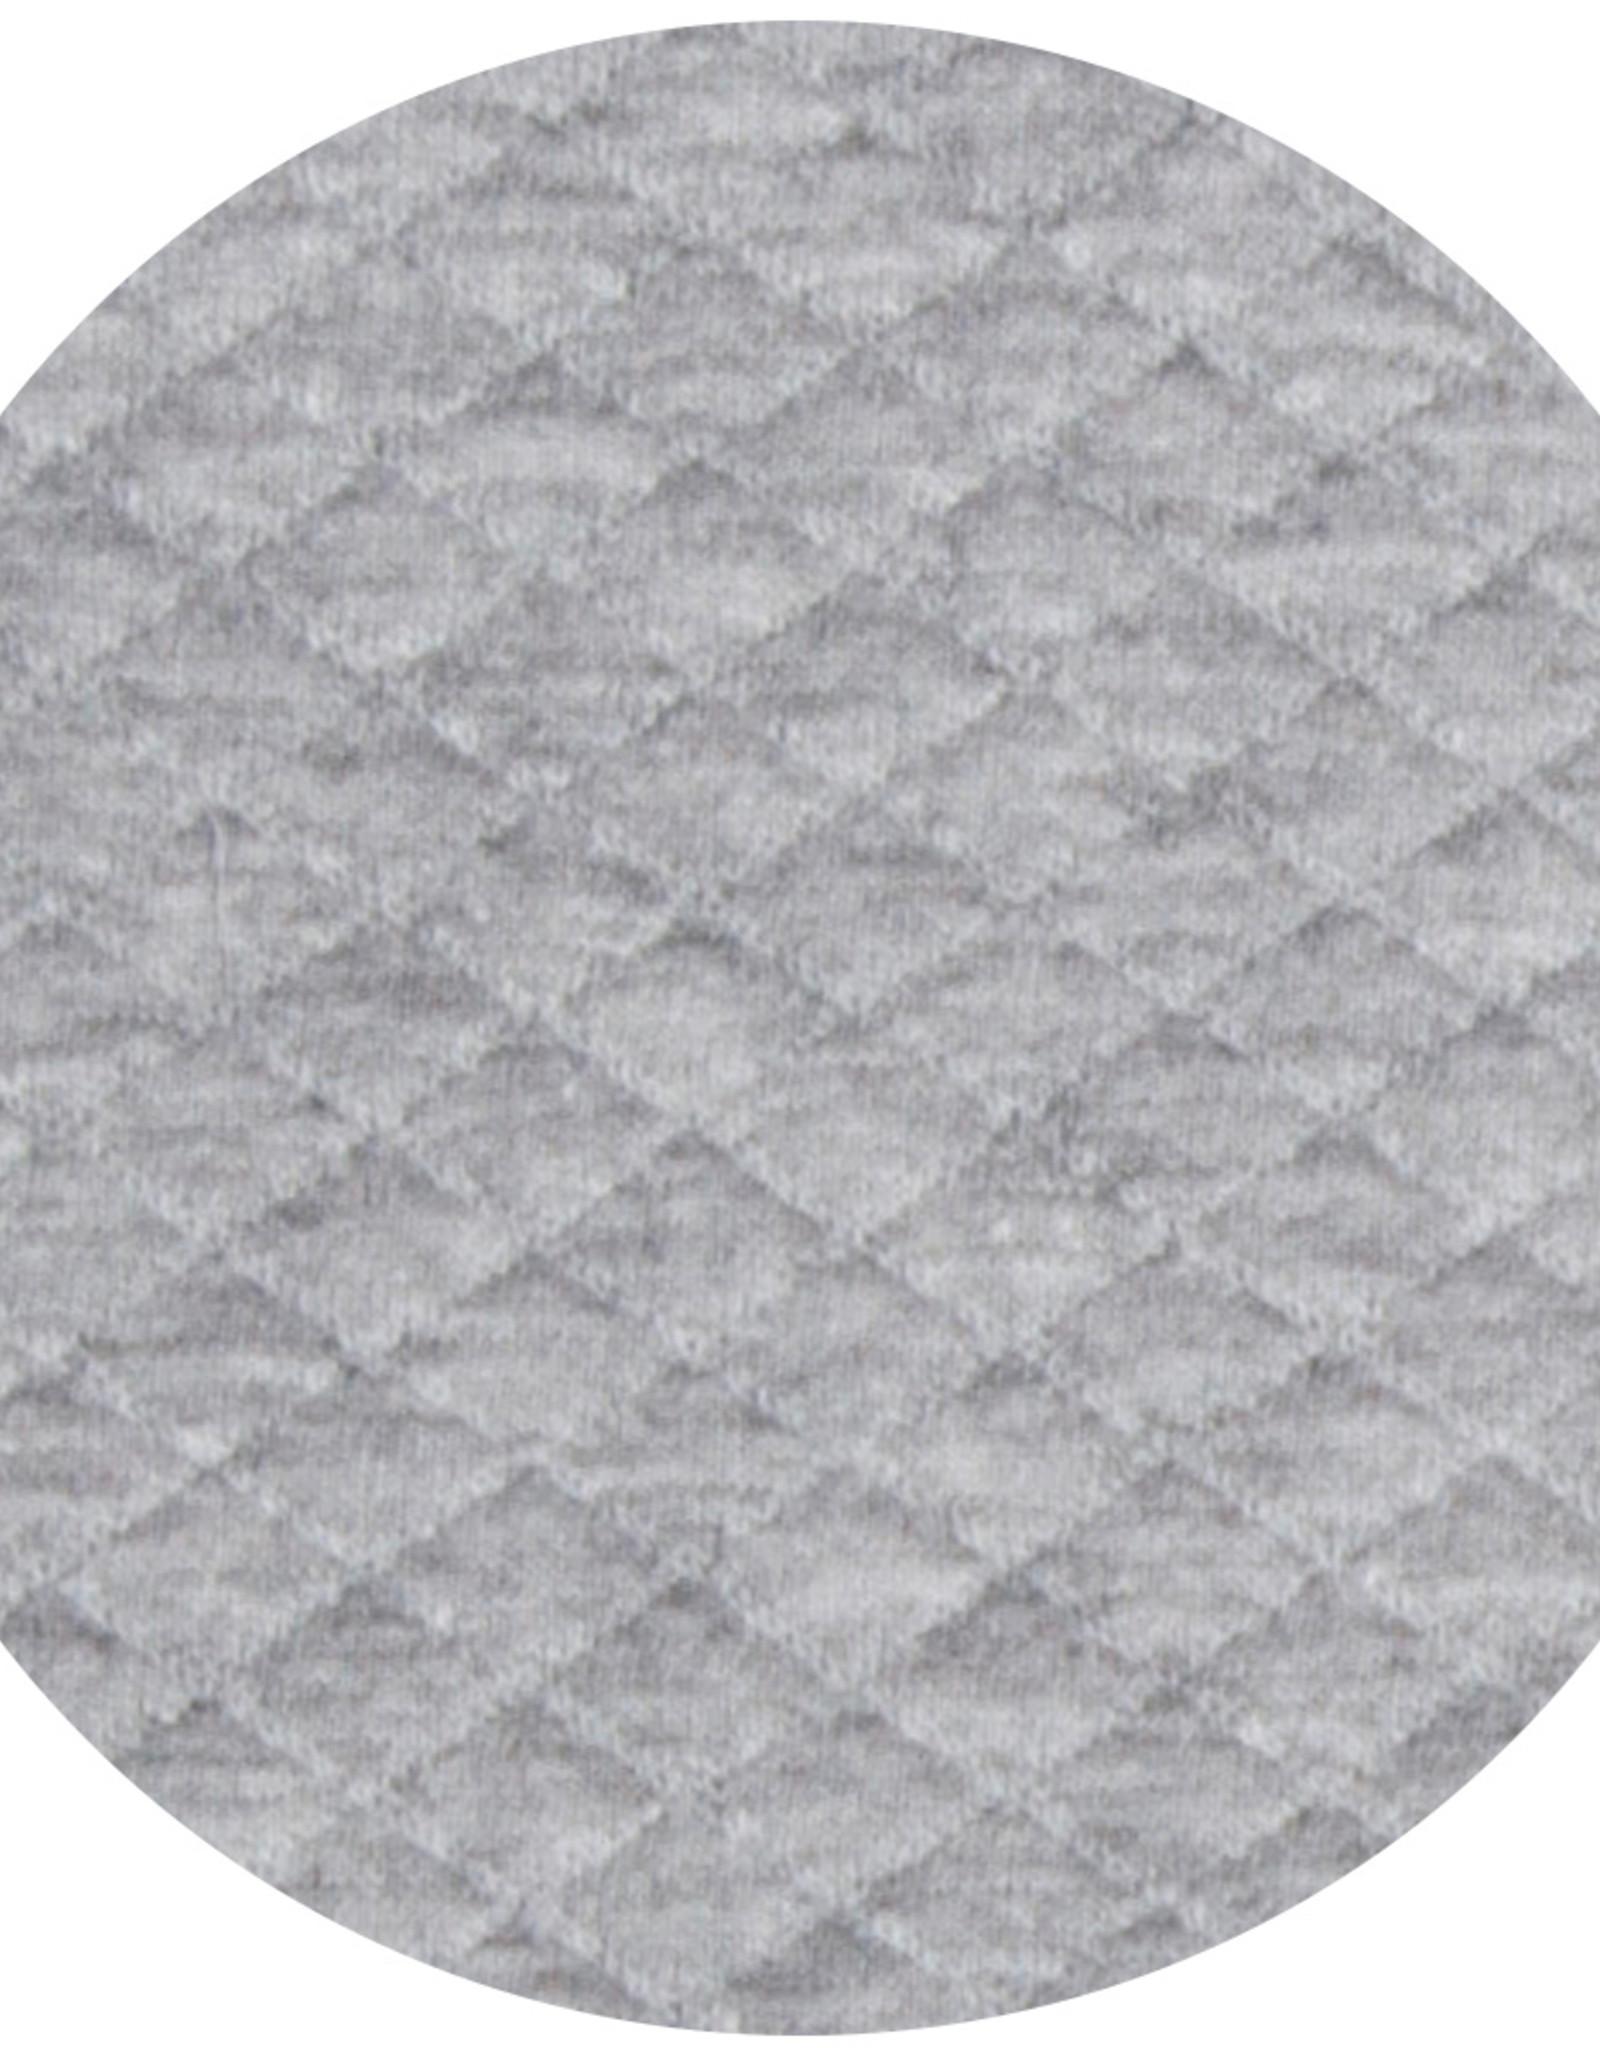 Les Rêves d'Anaïs  Rattle bunny diamond stone